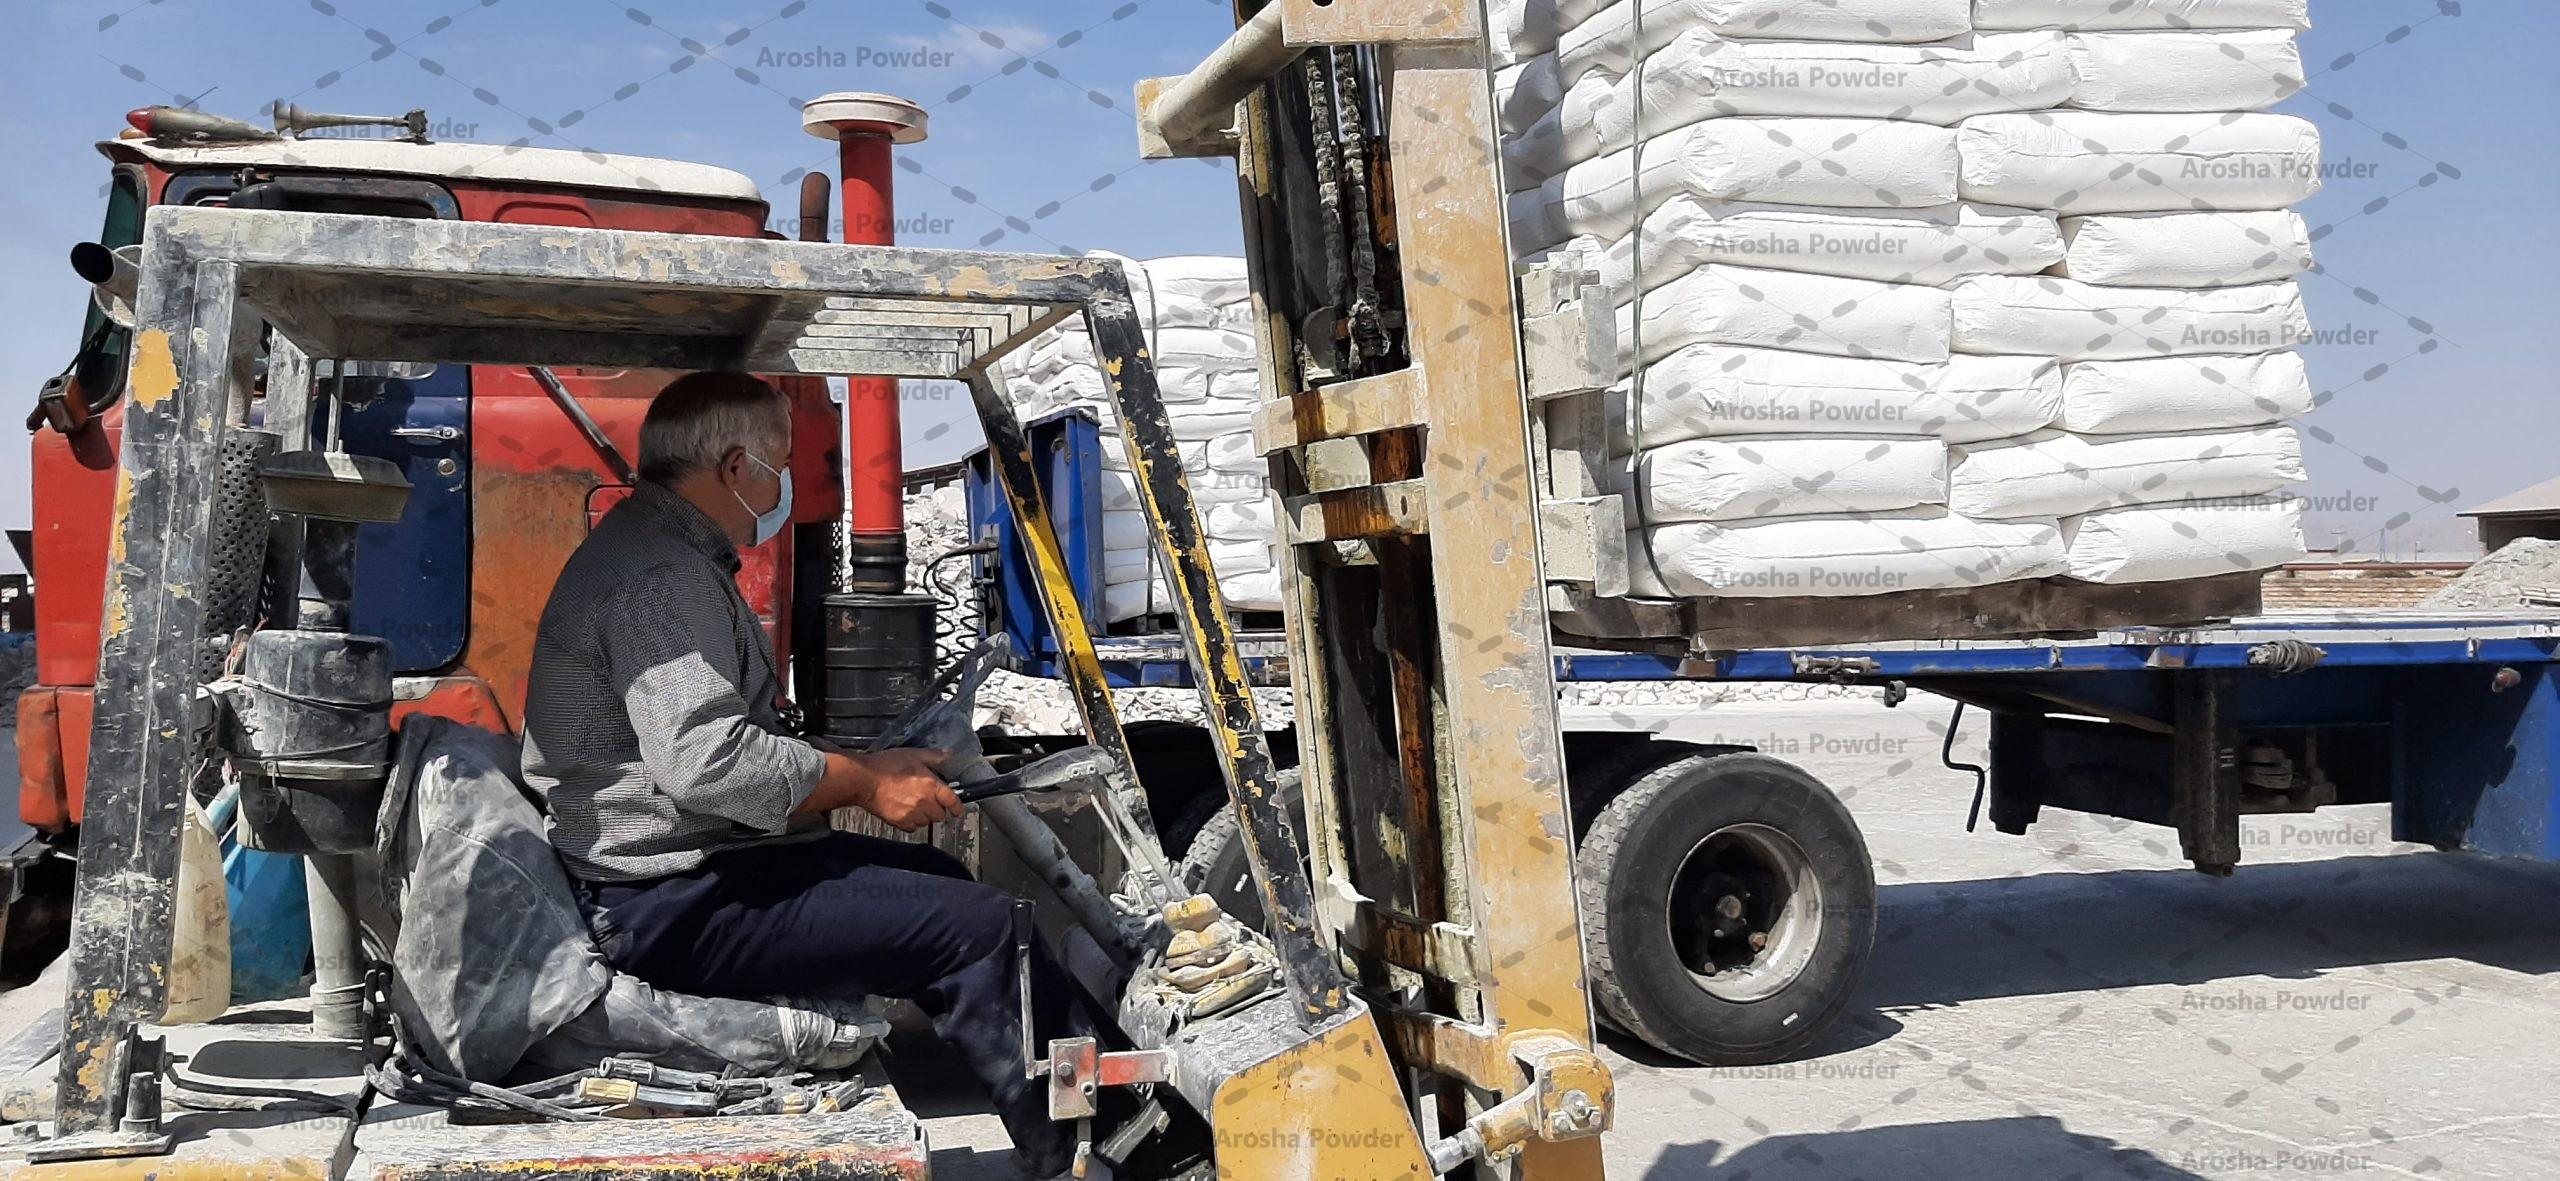 تولیدکننده کربنات کلسیم شیراز